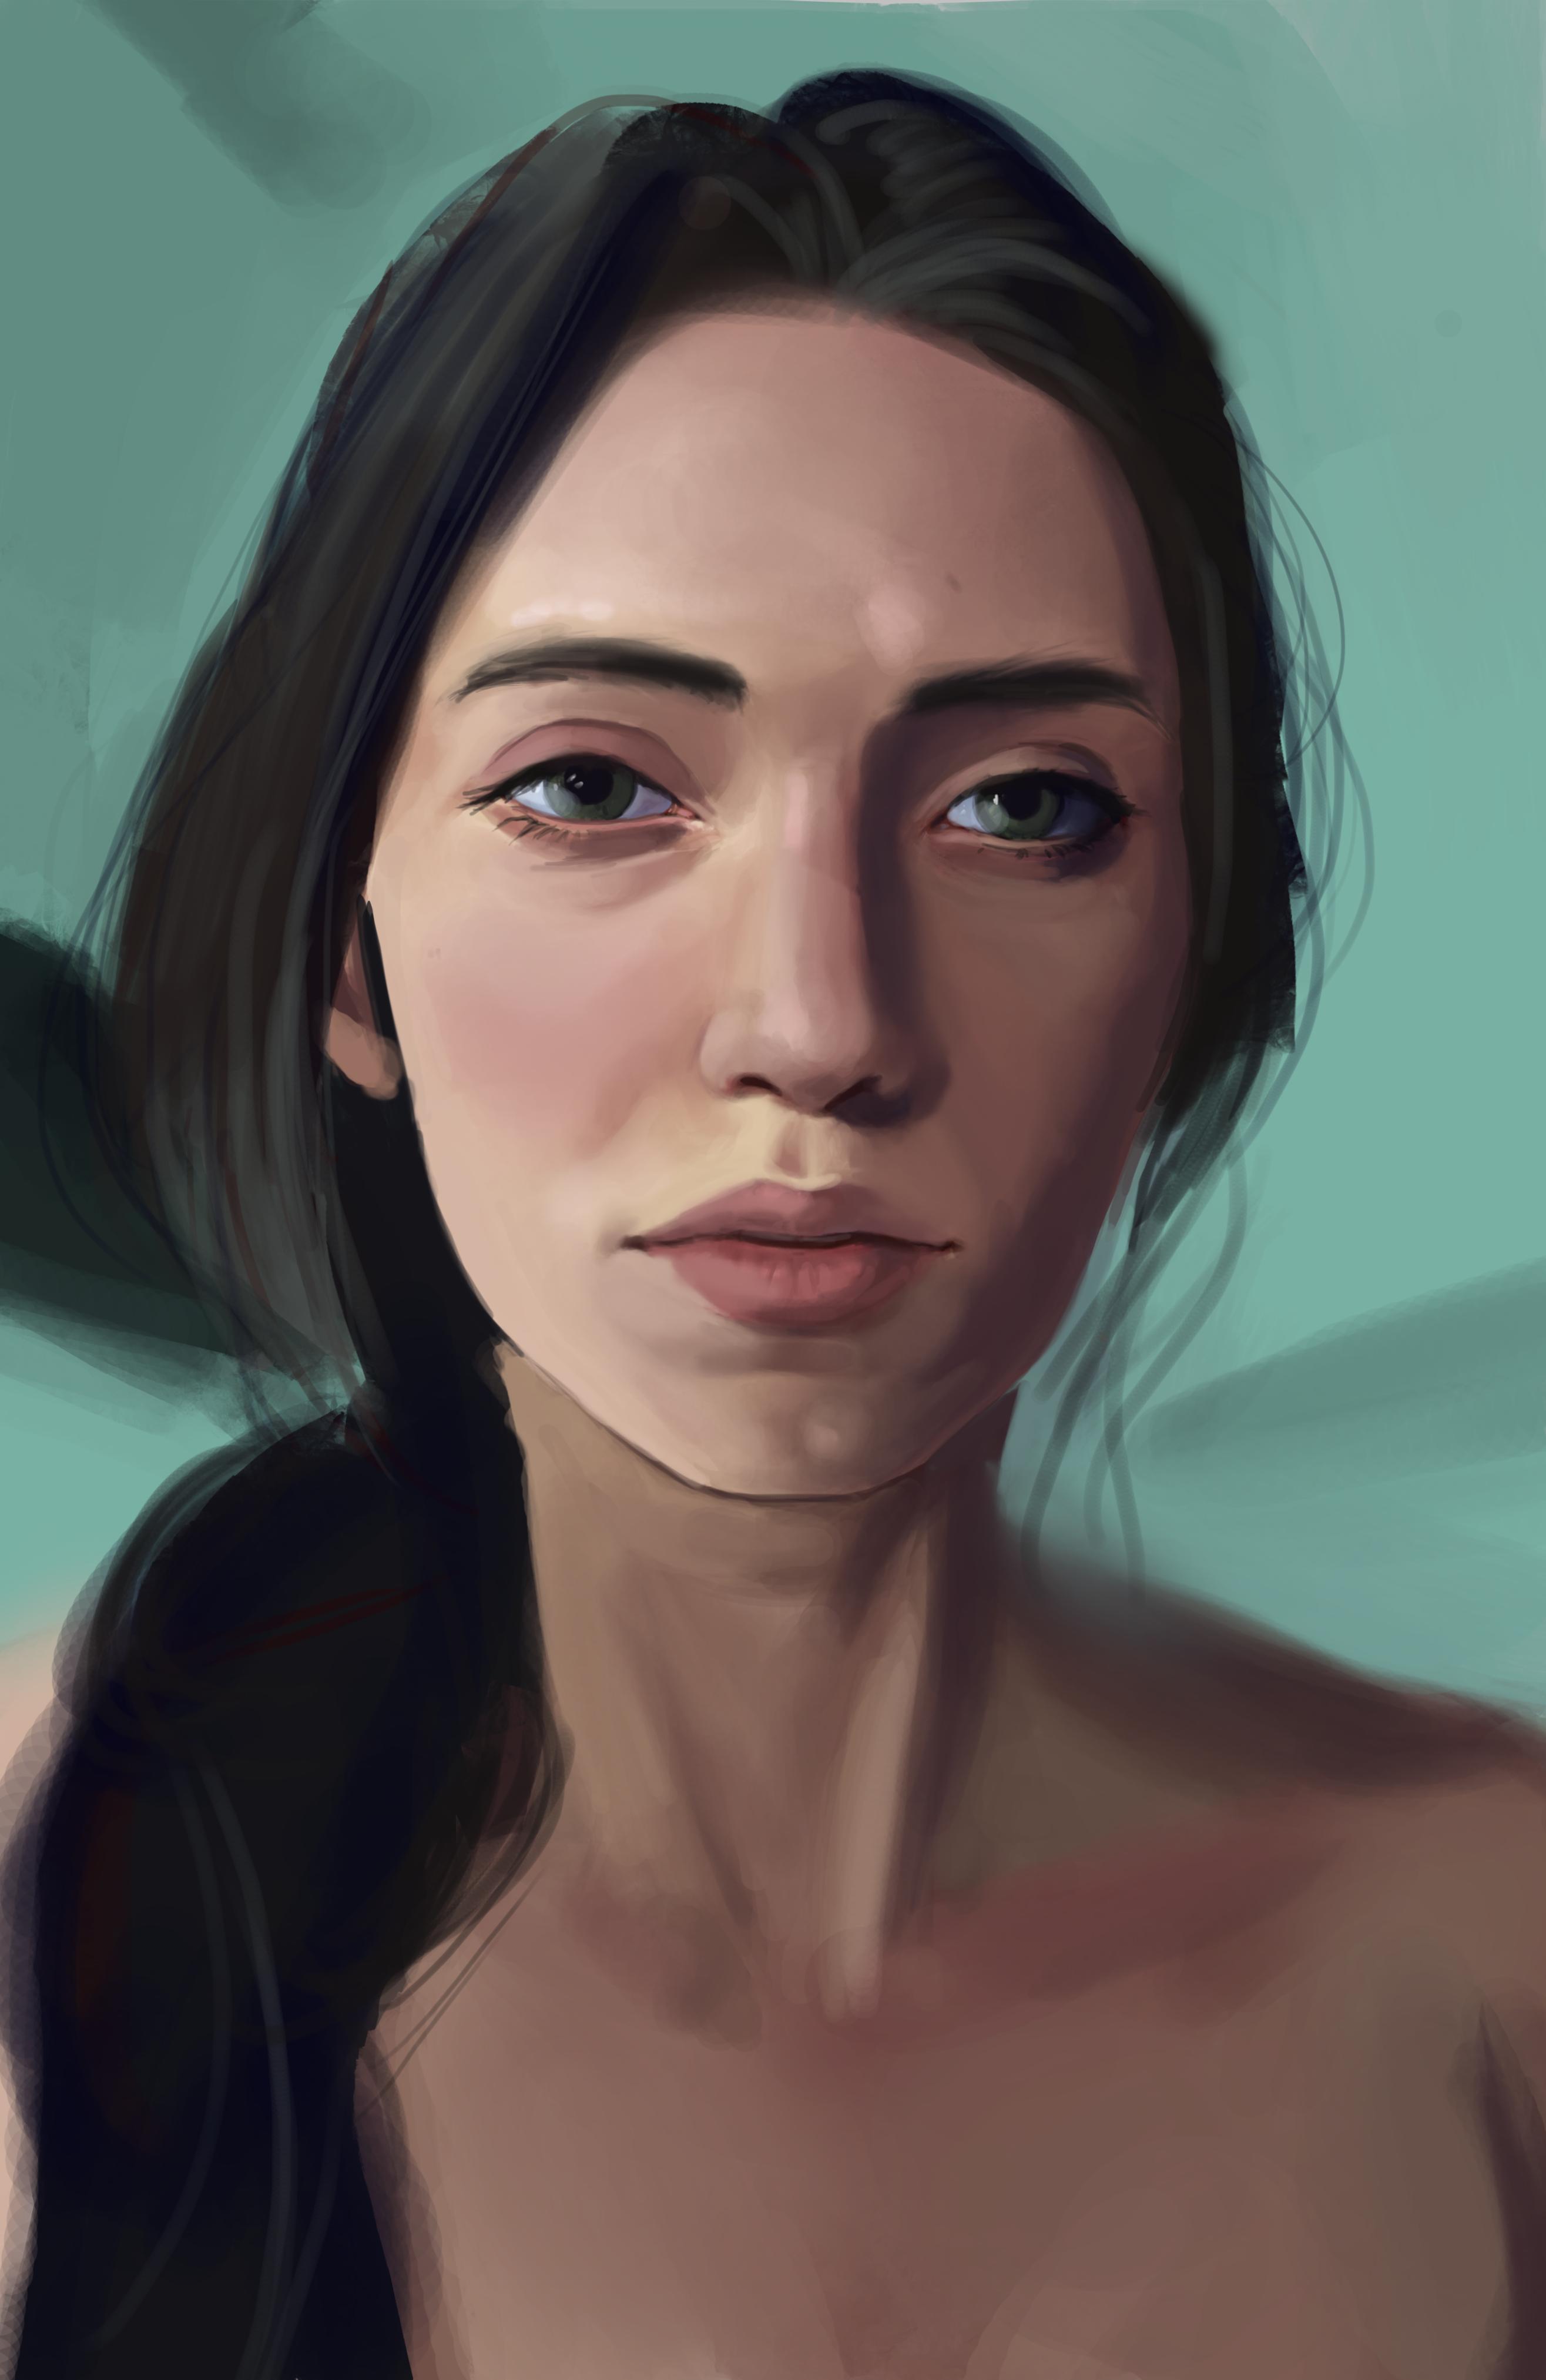 Digital portrait drawing of you